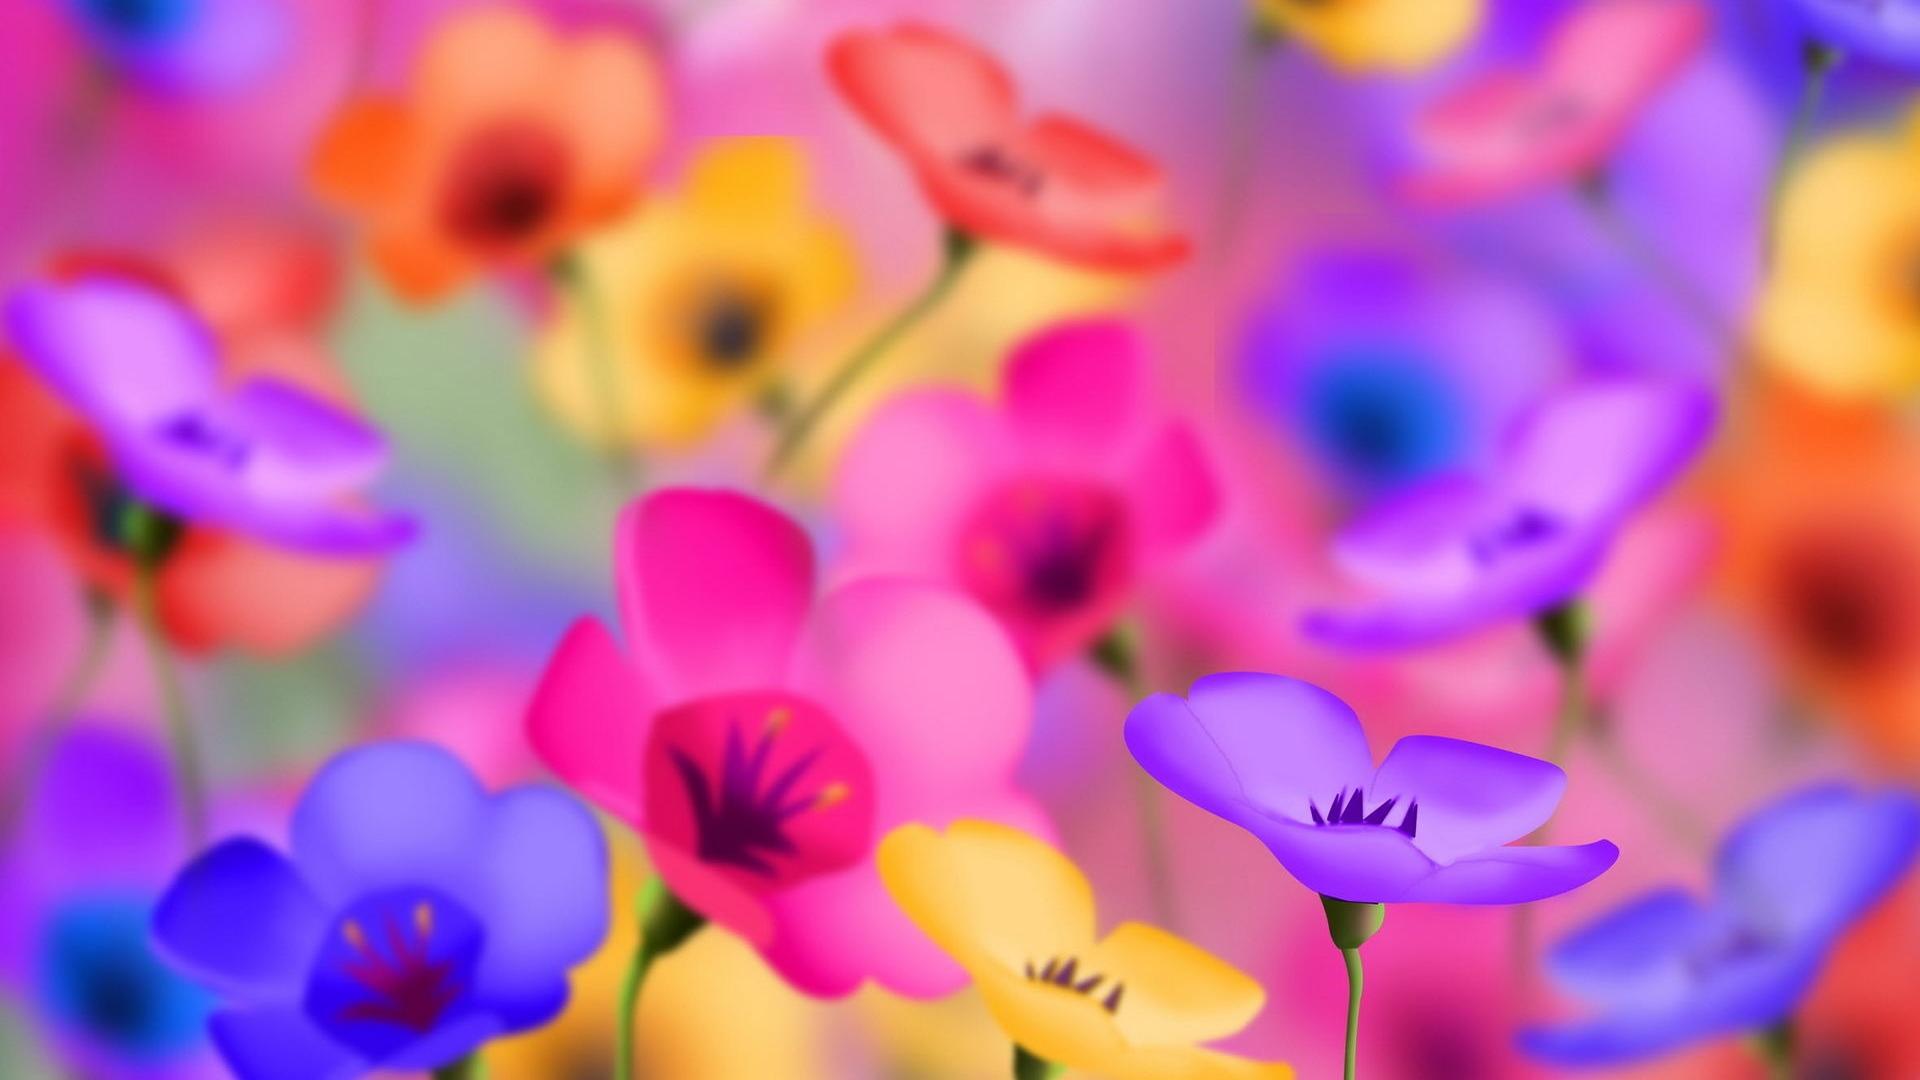 Cute Beautiful Flowers Wallpapers Cool HD 1920x1080